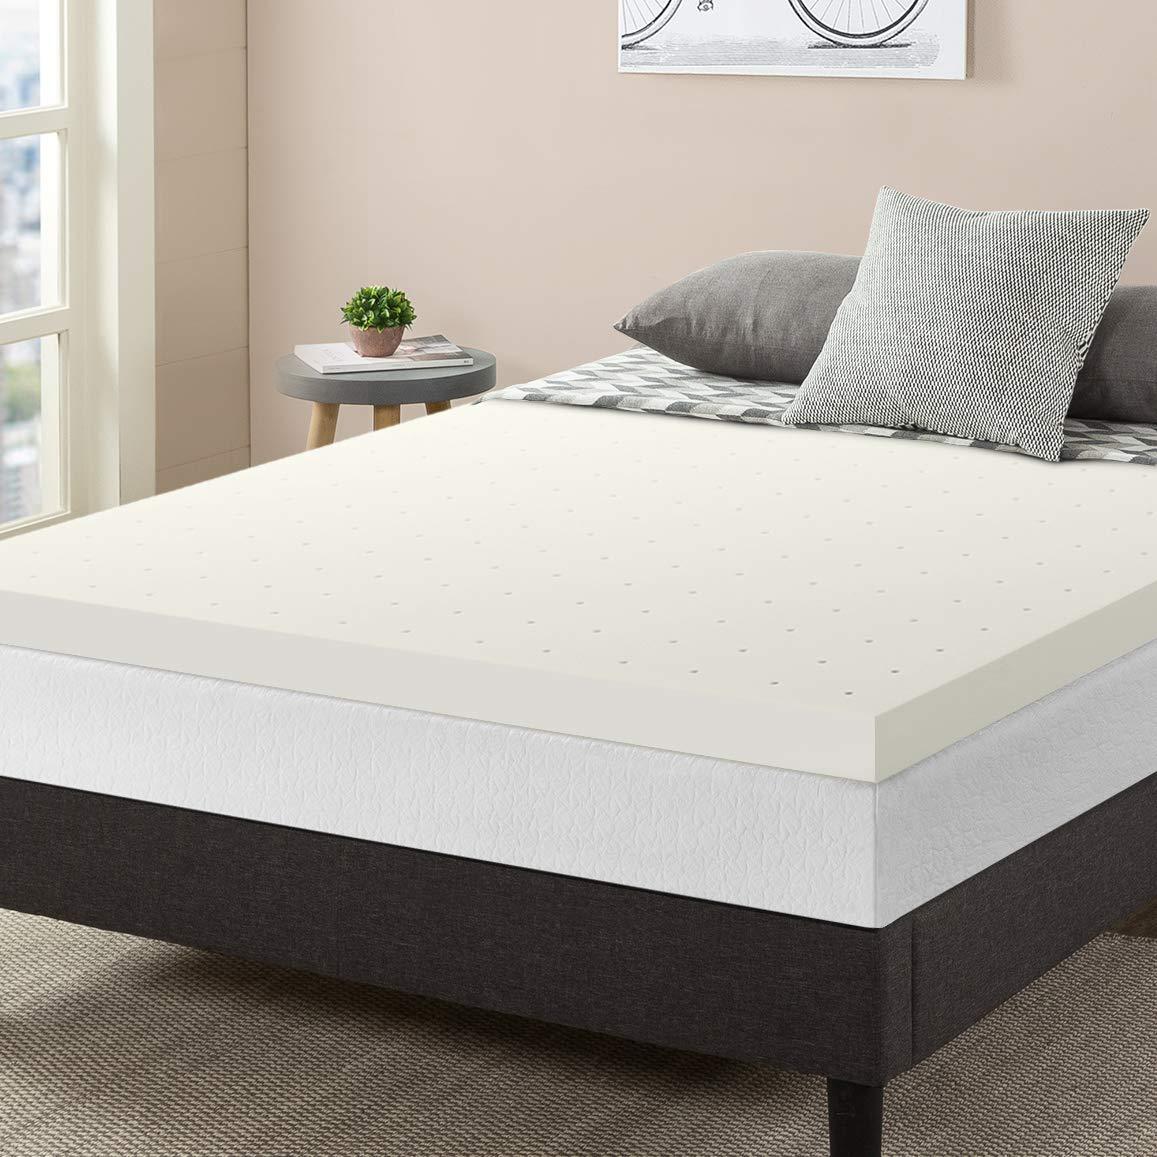 Best Price Mattress 3 Inch Memory Foam Topper RV Bed Mattress, King by Best Price Mattress